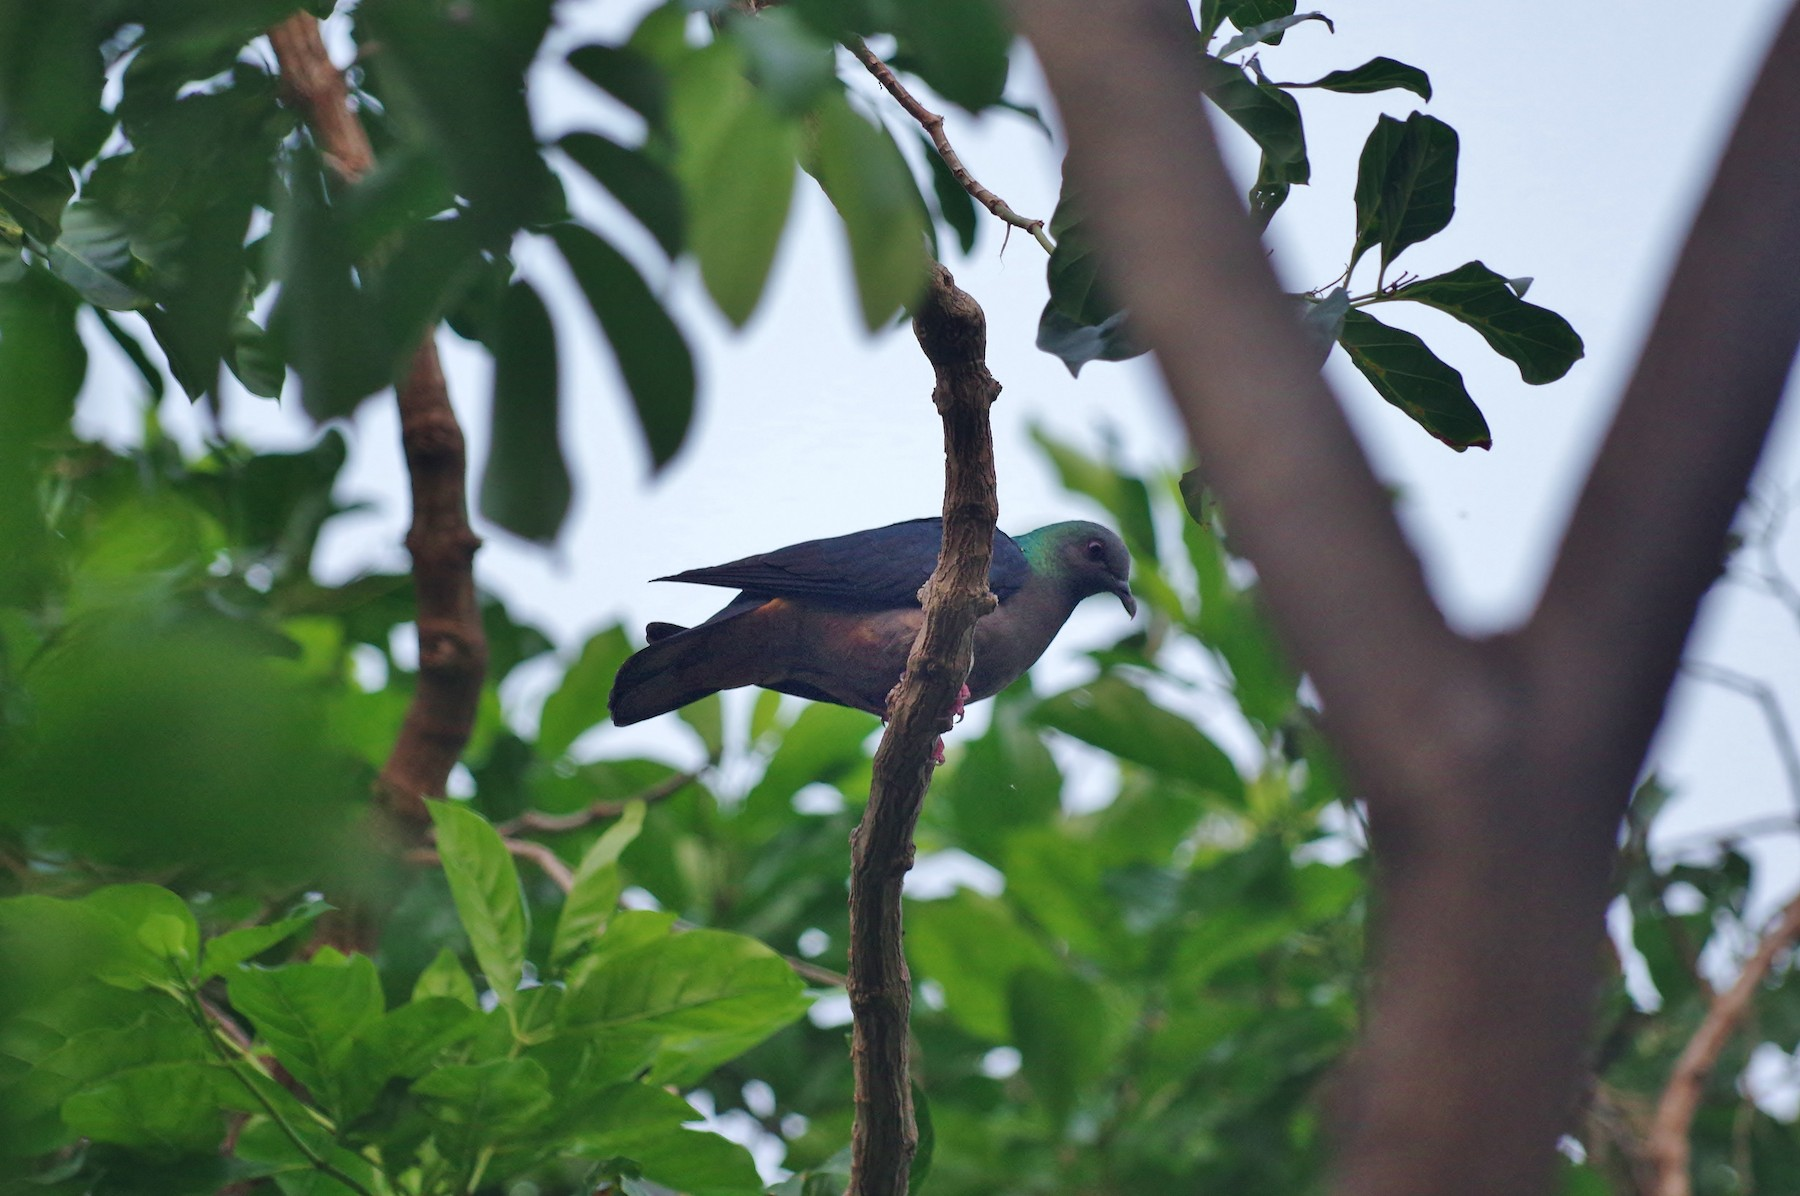 Sao Tome Pigeon - Thibaud Aronson